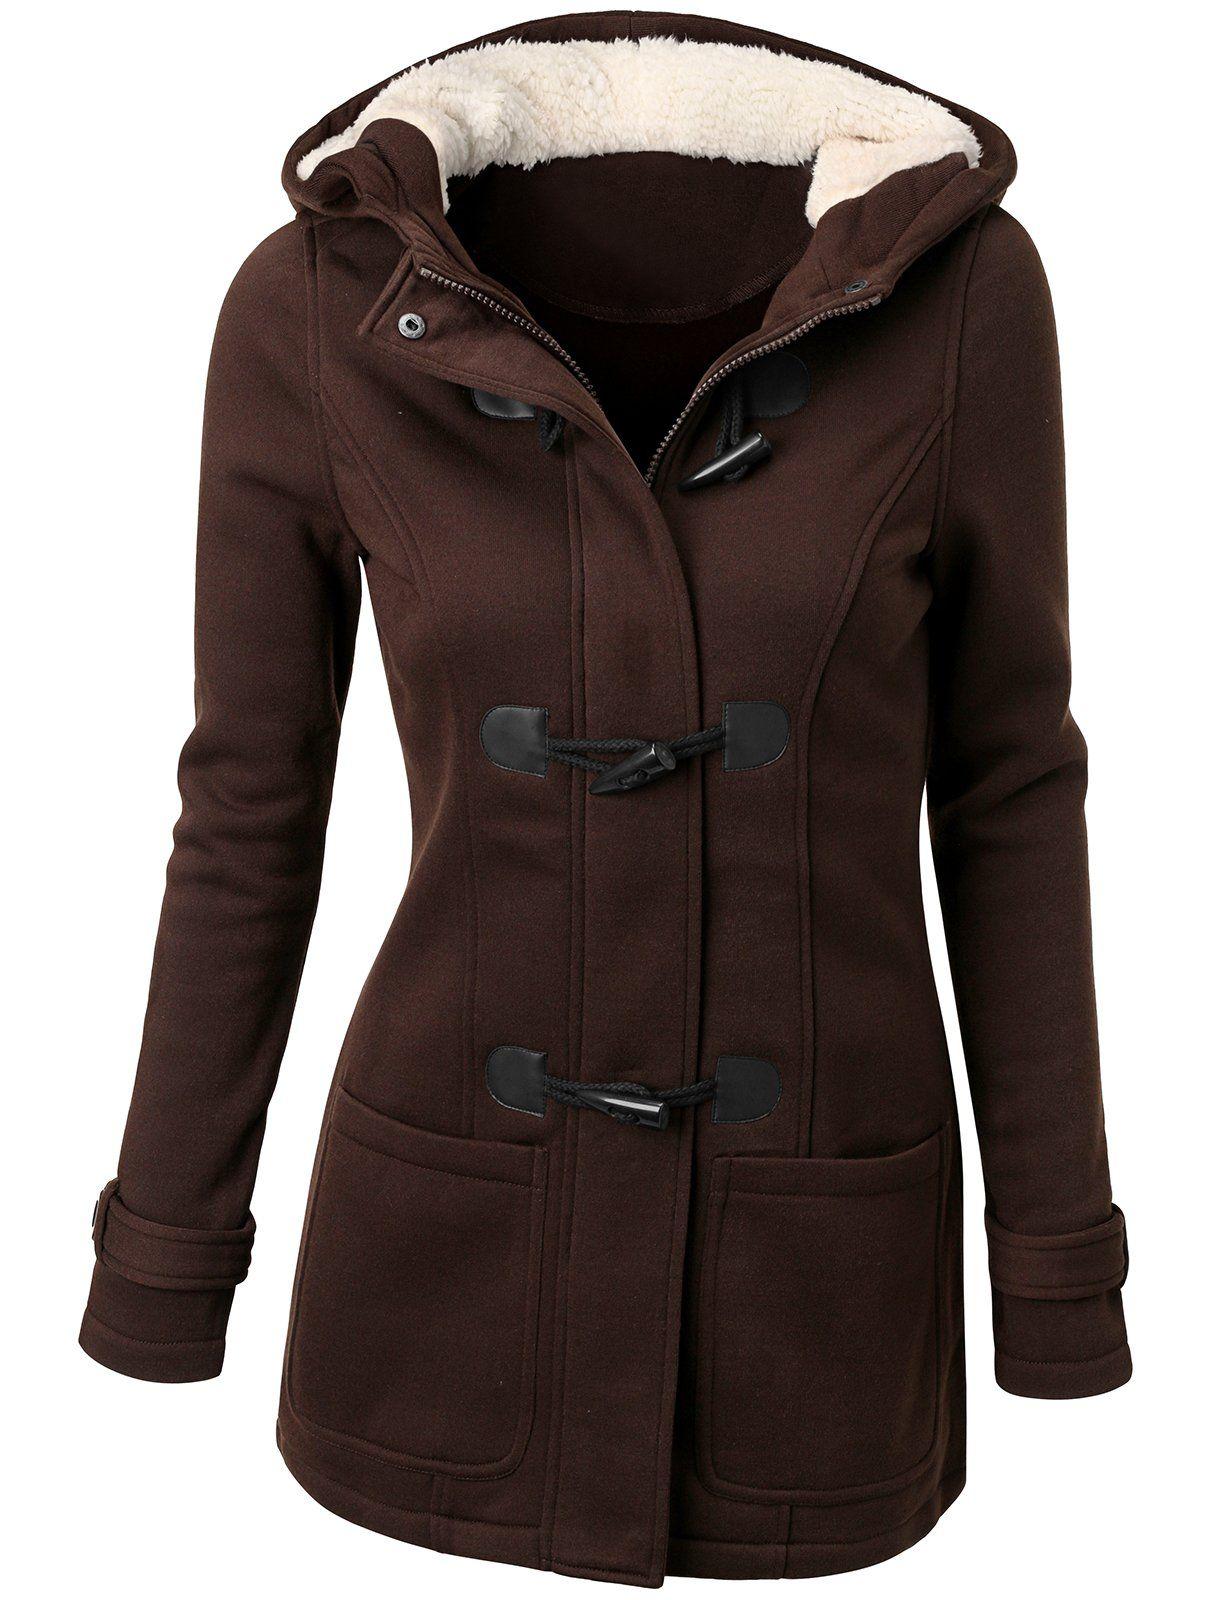 Doublju Womens Wool Blended Classic Coat Jacket Winter Fashion Coats Trench Coats Women Women Overcoat [ 1600 x 1230 Pixel ]